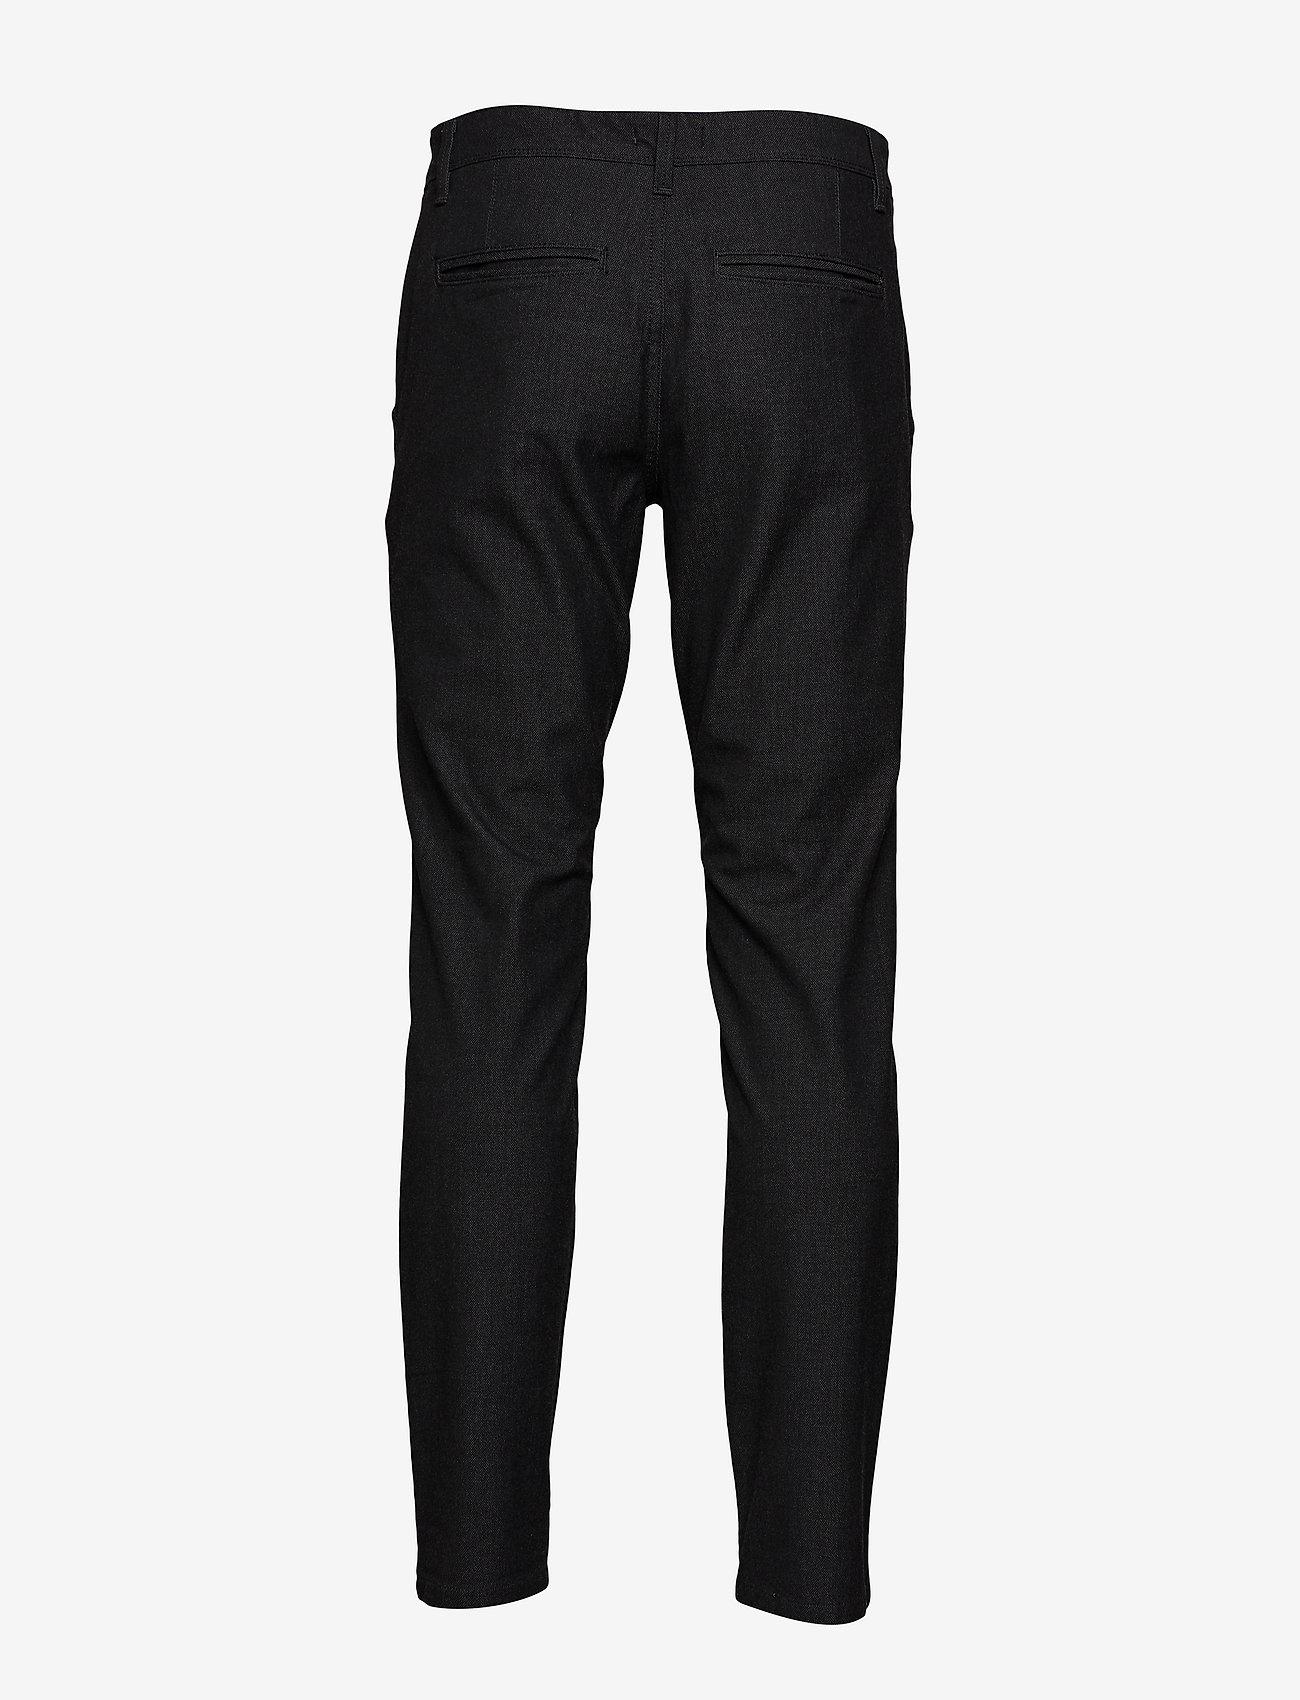 Selected Homme - SLHSLIM-STORM FLEX SMART PANTS W NOOS - suitbukser - grey - 1